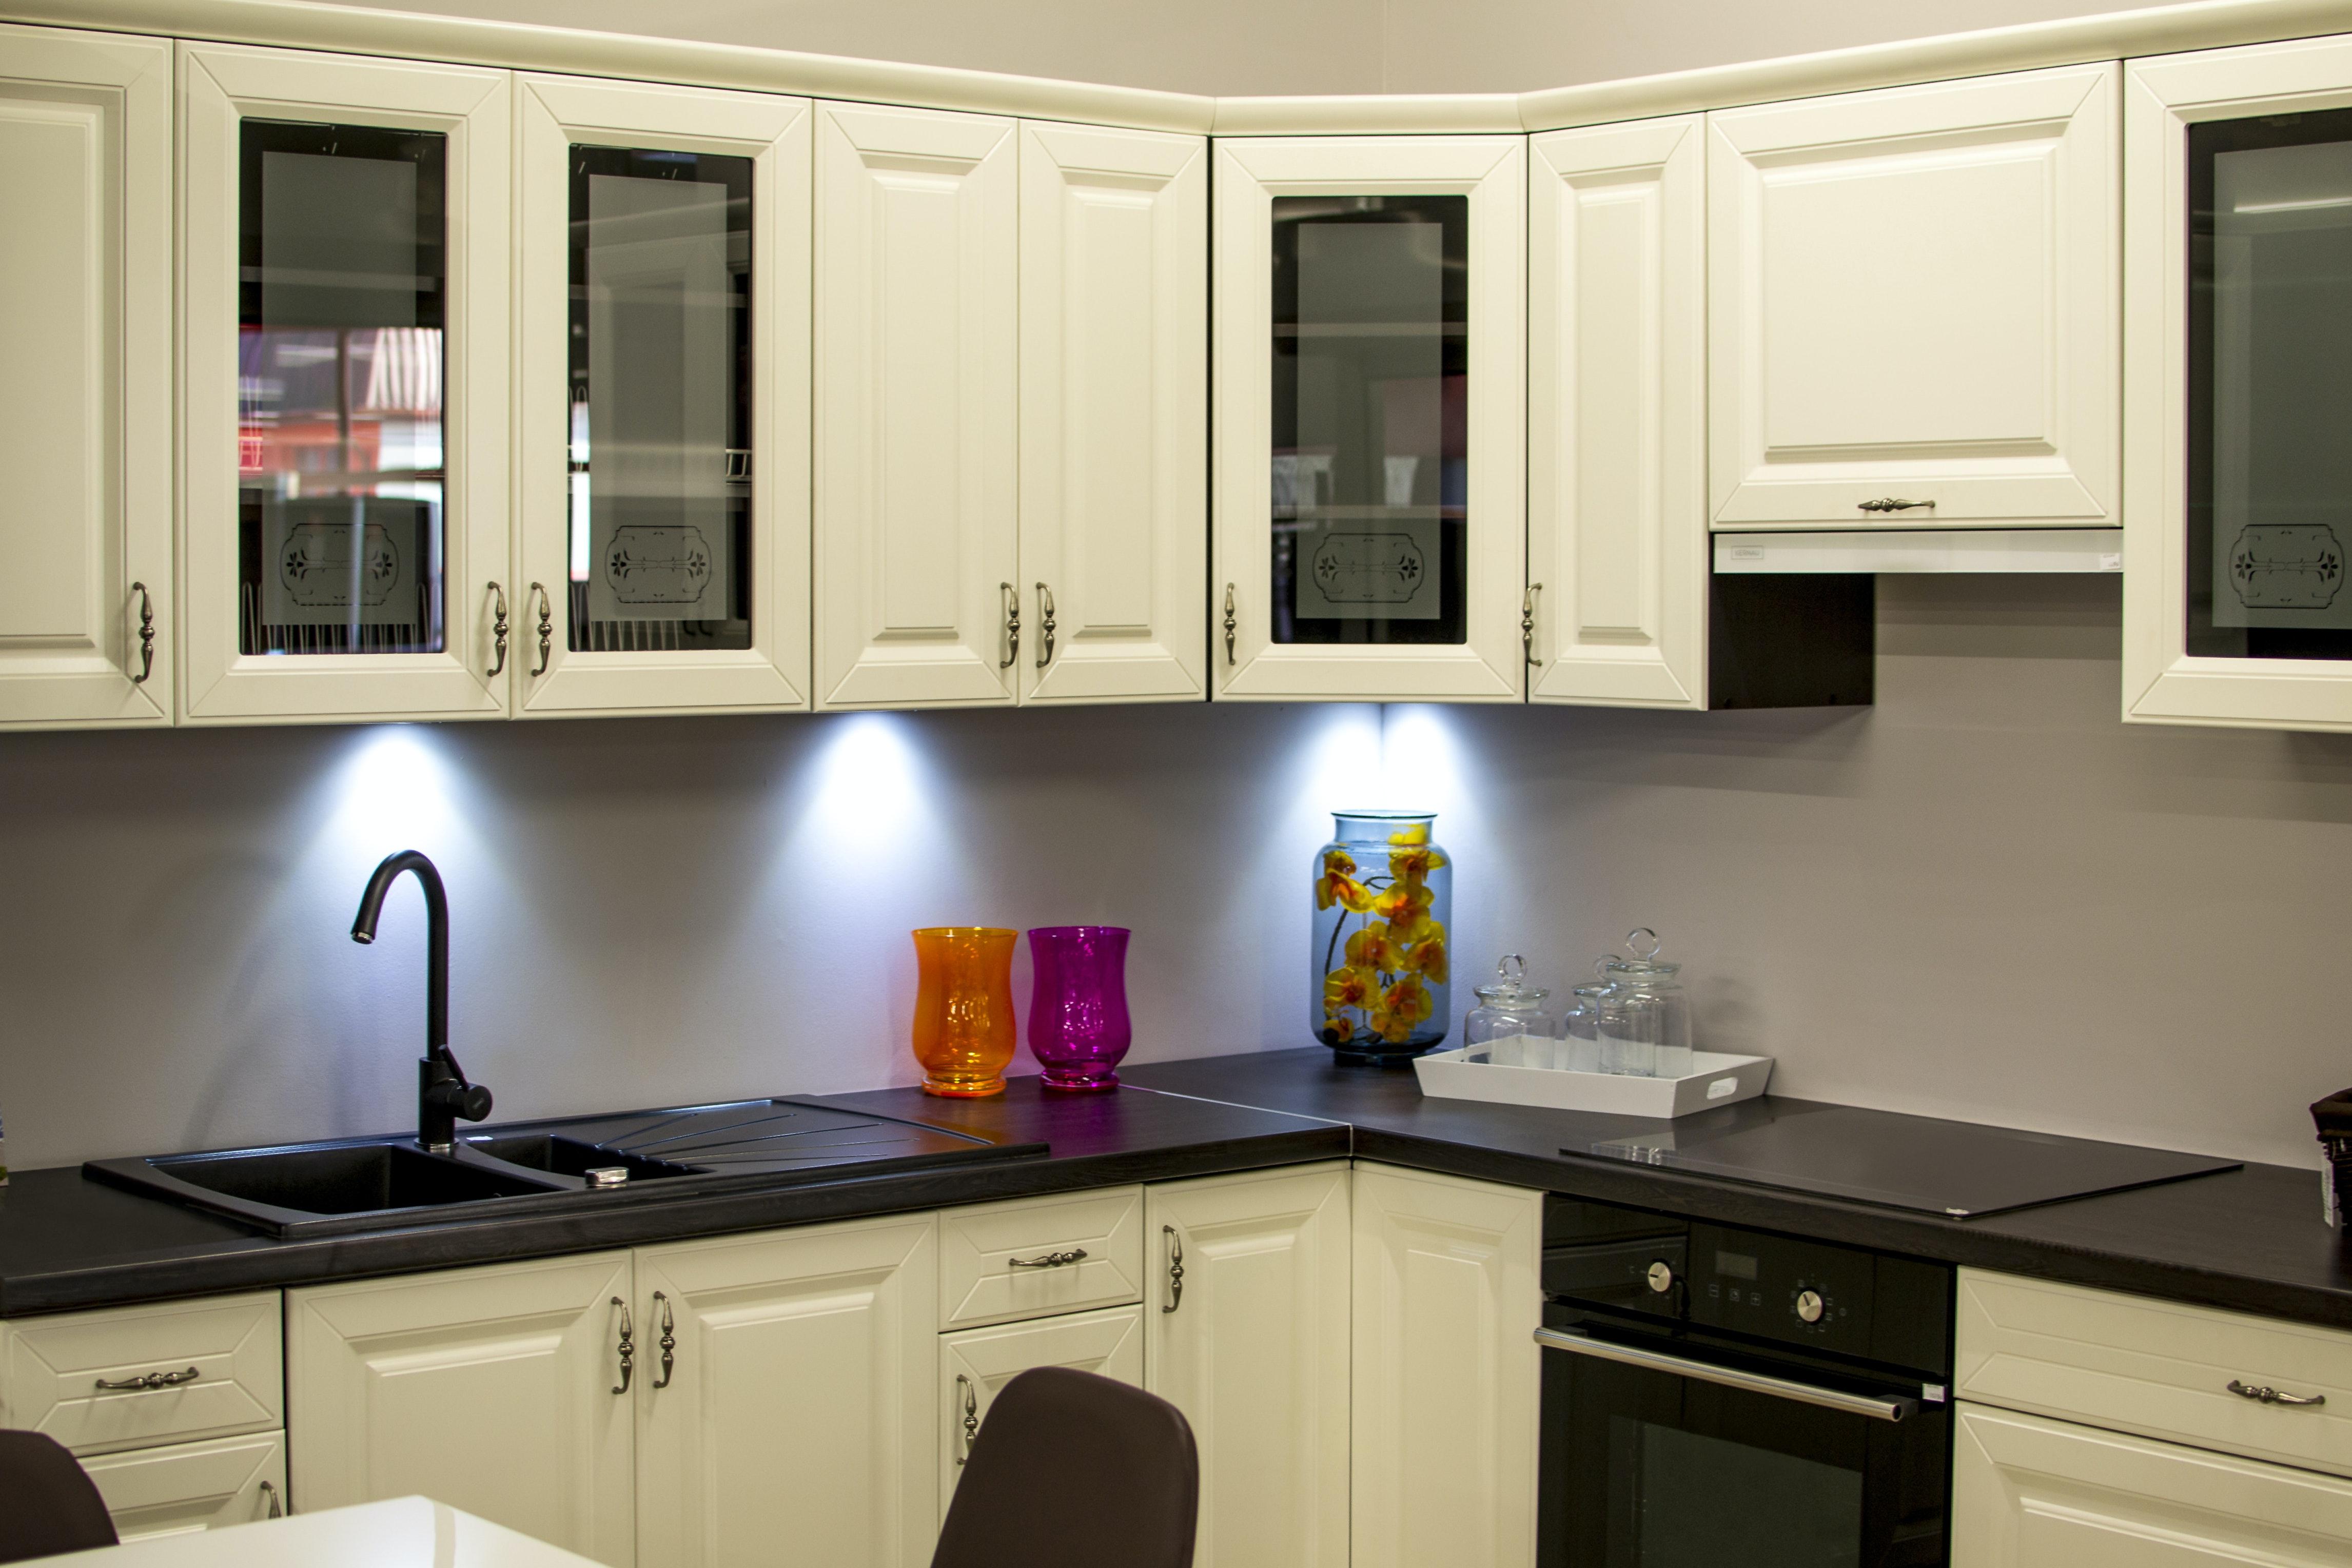 White Kitchen Cabinet · Free Stock Photo